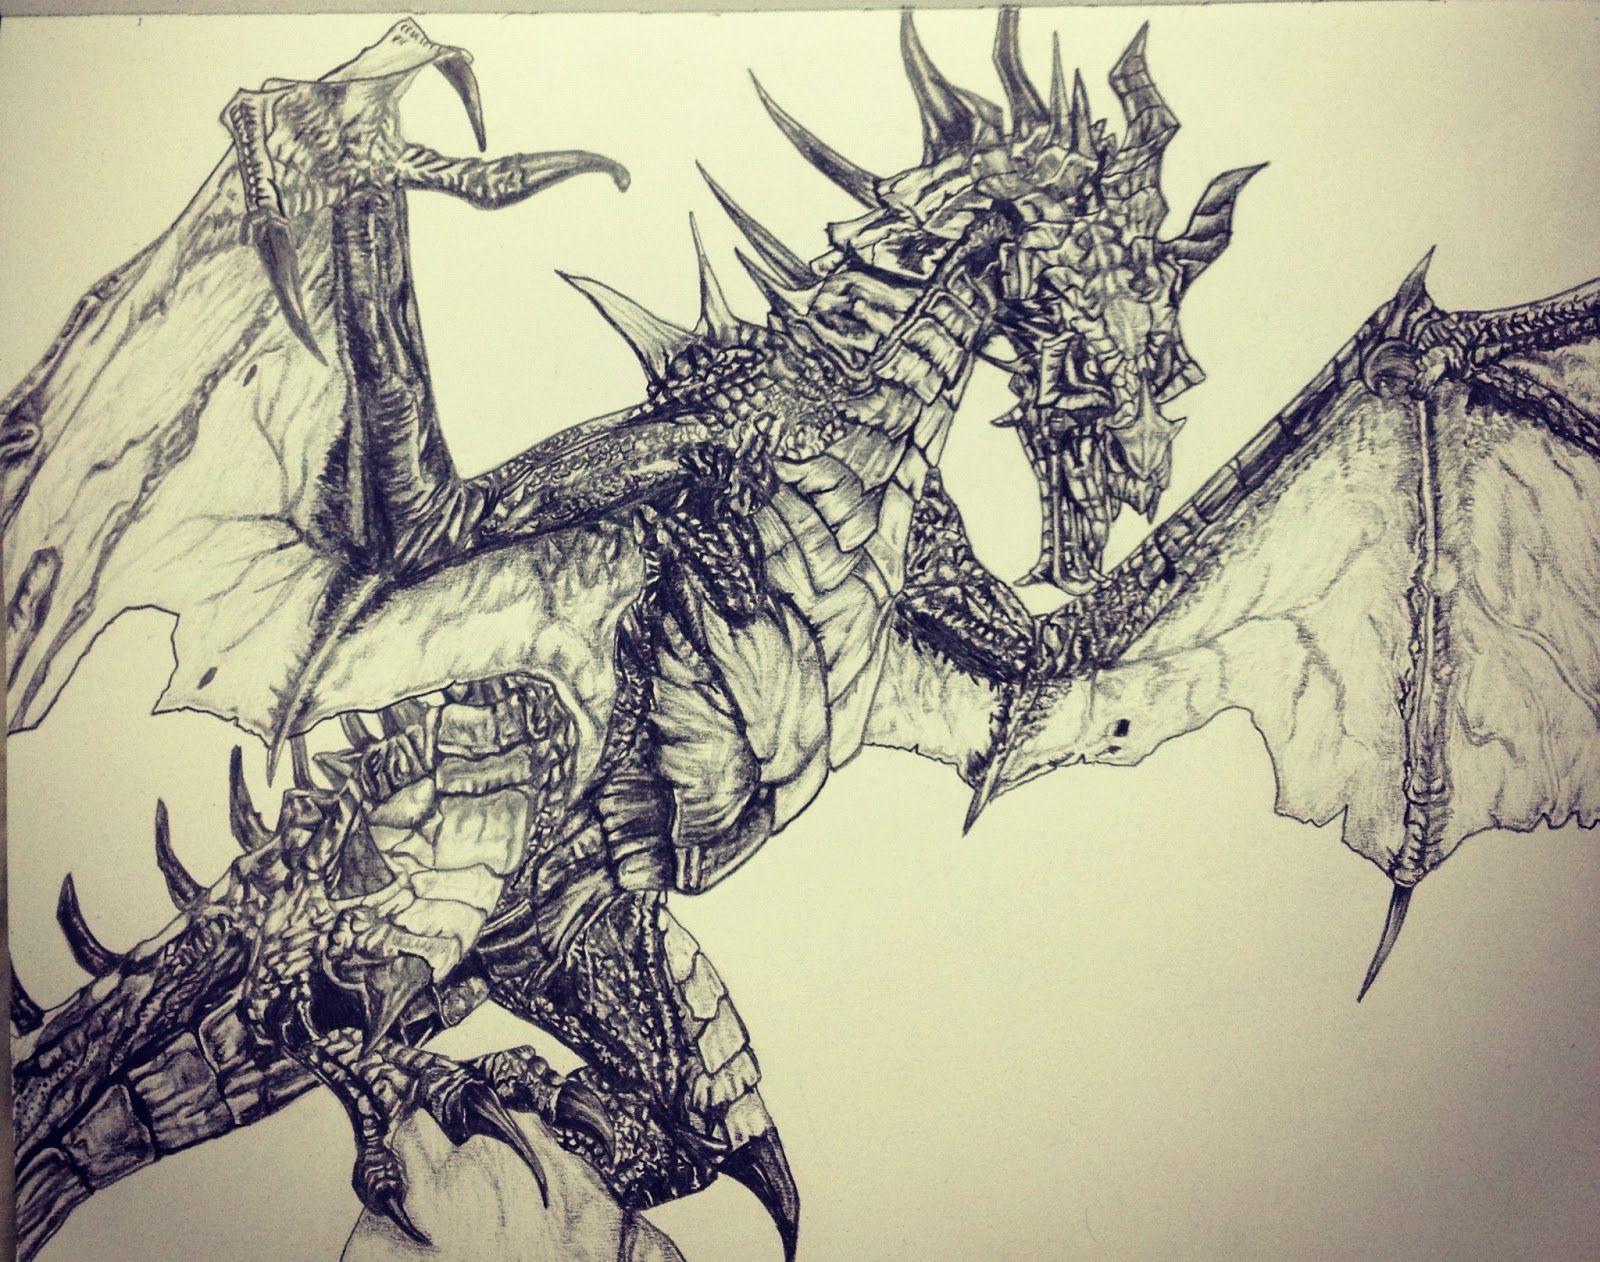 Картинки драконов из скайрима карандашом